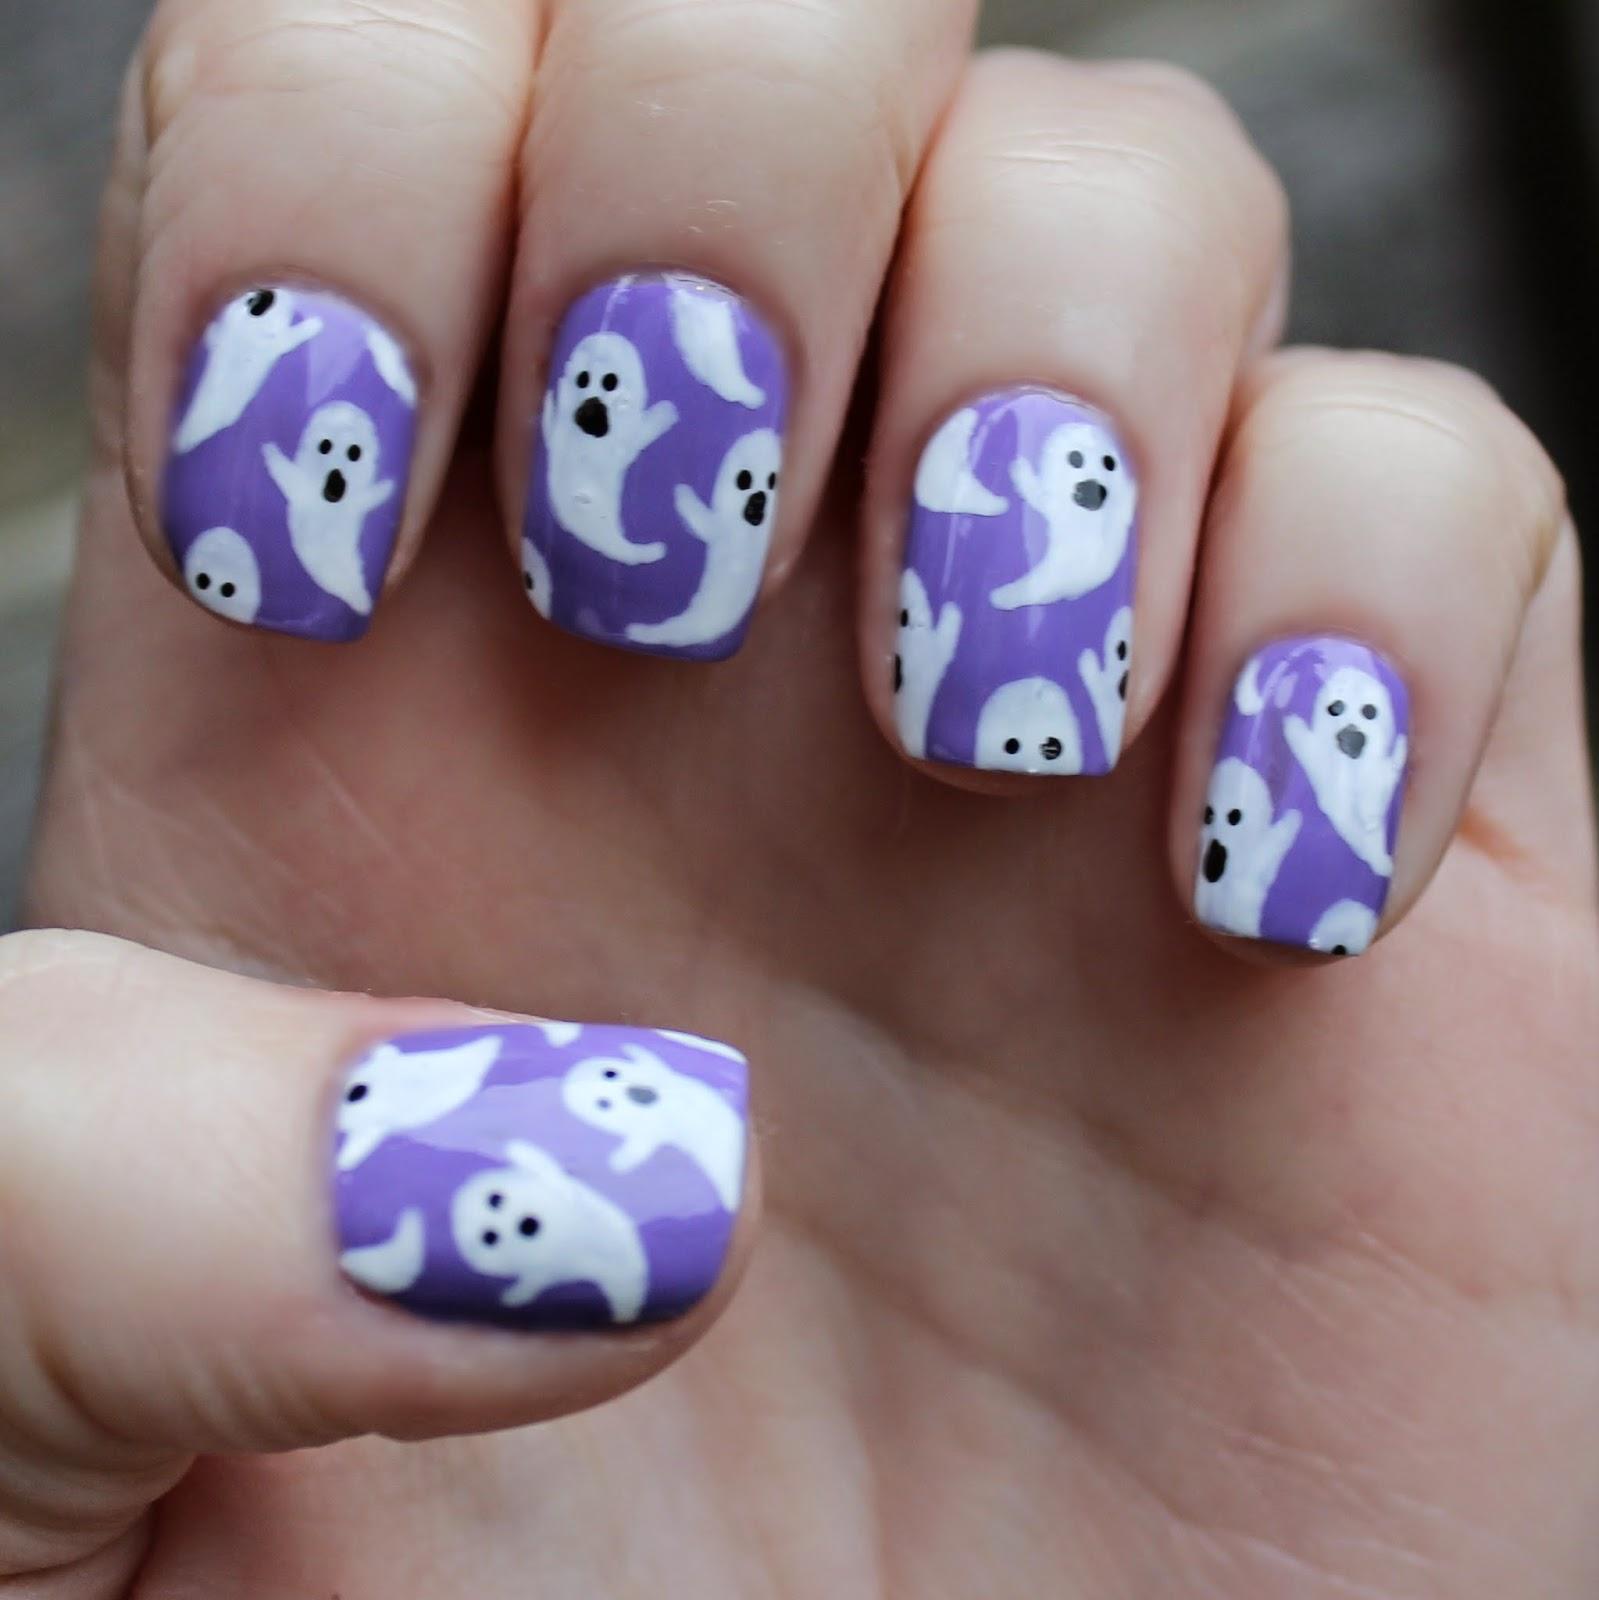 Dahlia Nails: Cute Ghost Nails For Hallowe'en